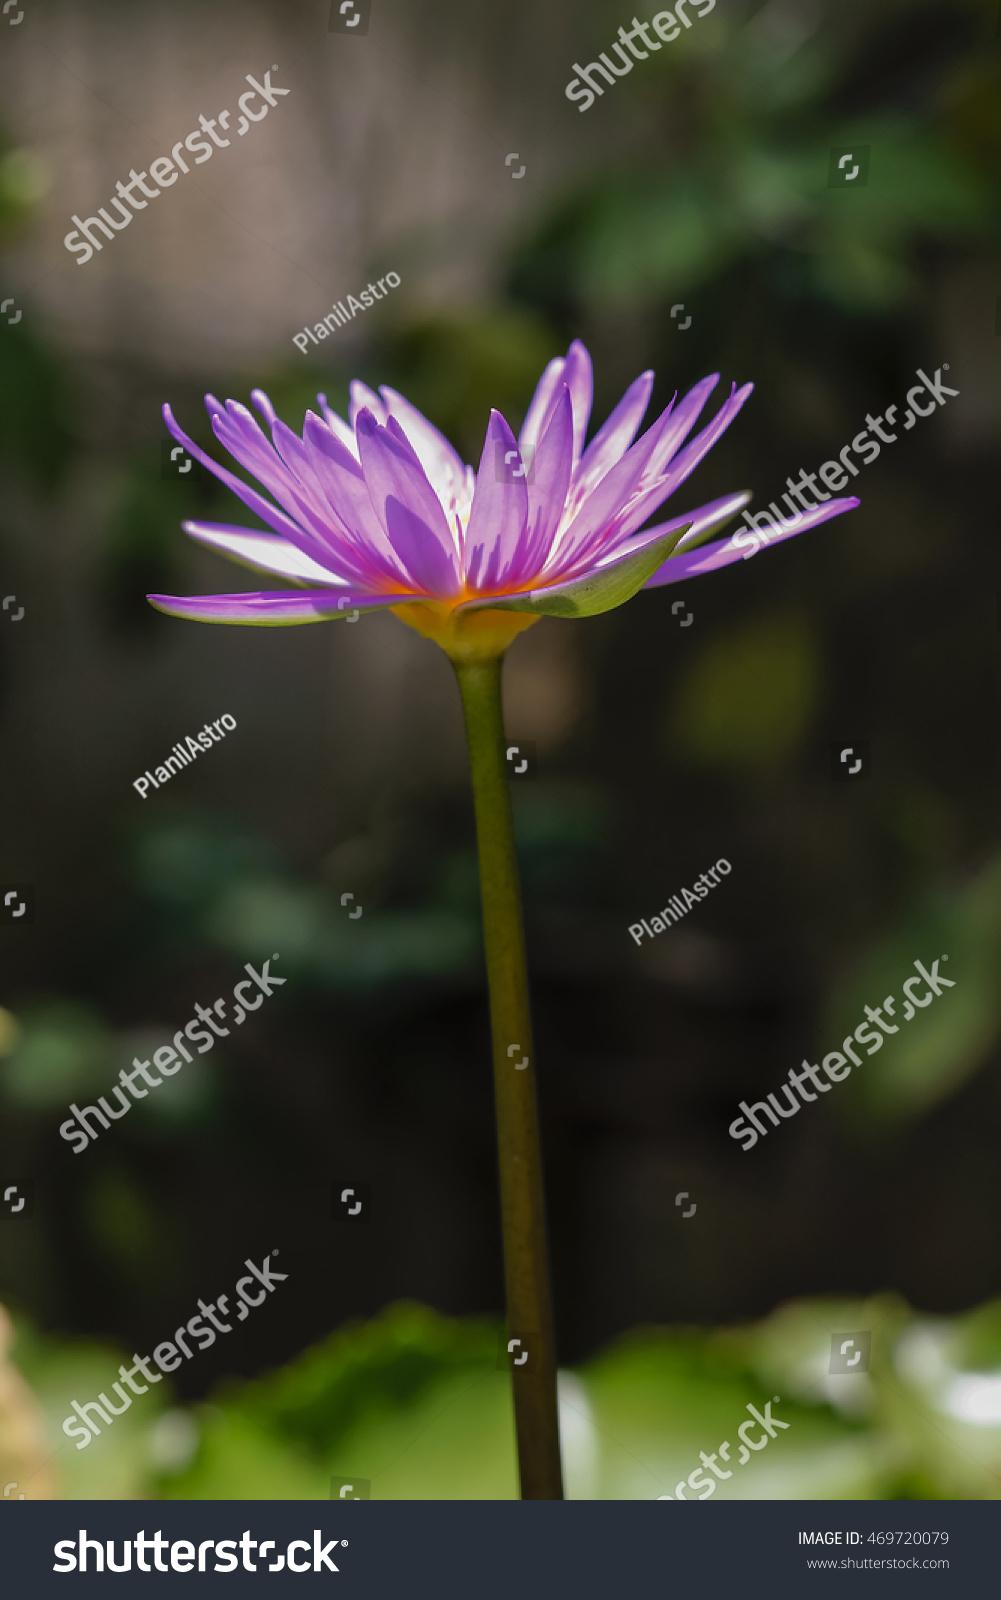 Thai lotus flower stock photo royalty free 469720079 shutterstock thai lotus flower izmirmasajfo